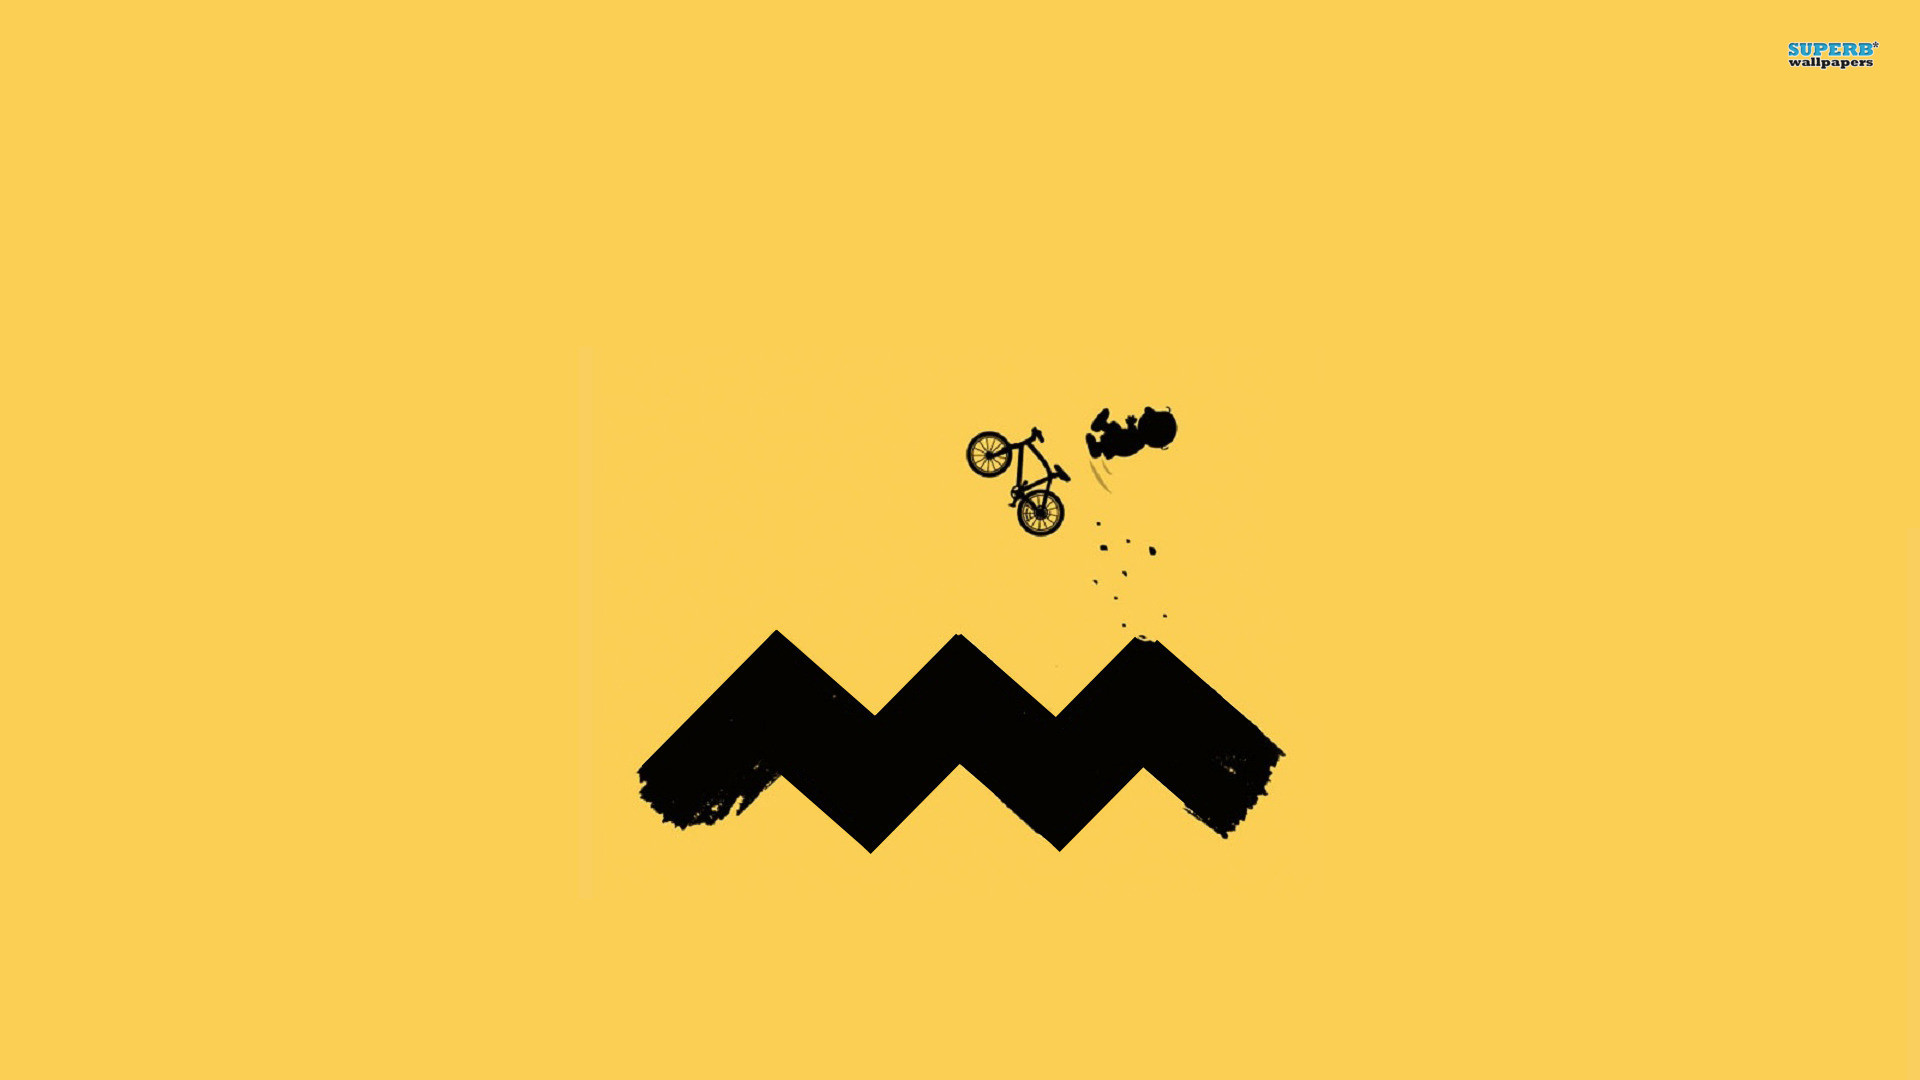 Charlie Brown Wallpaper     #48331